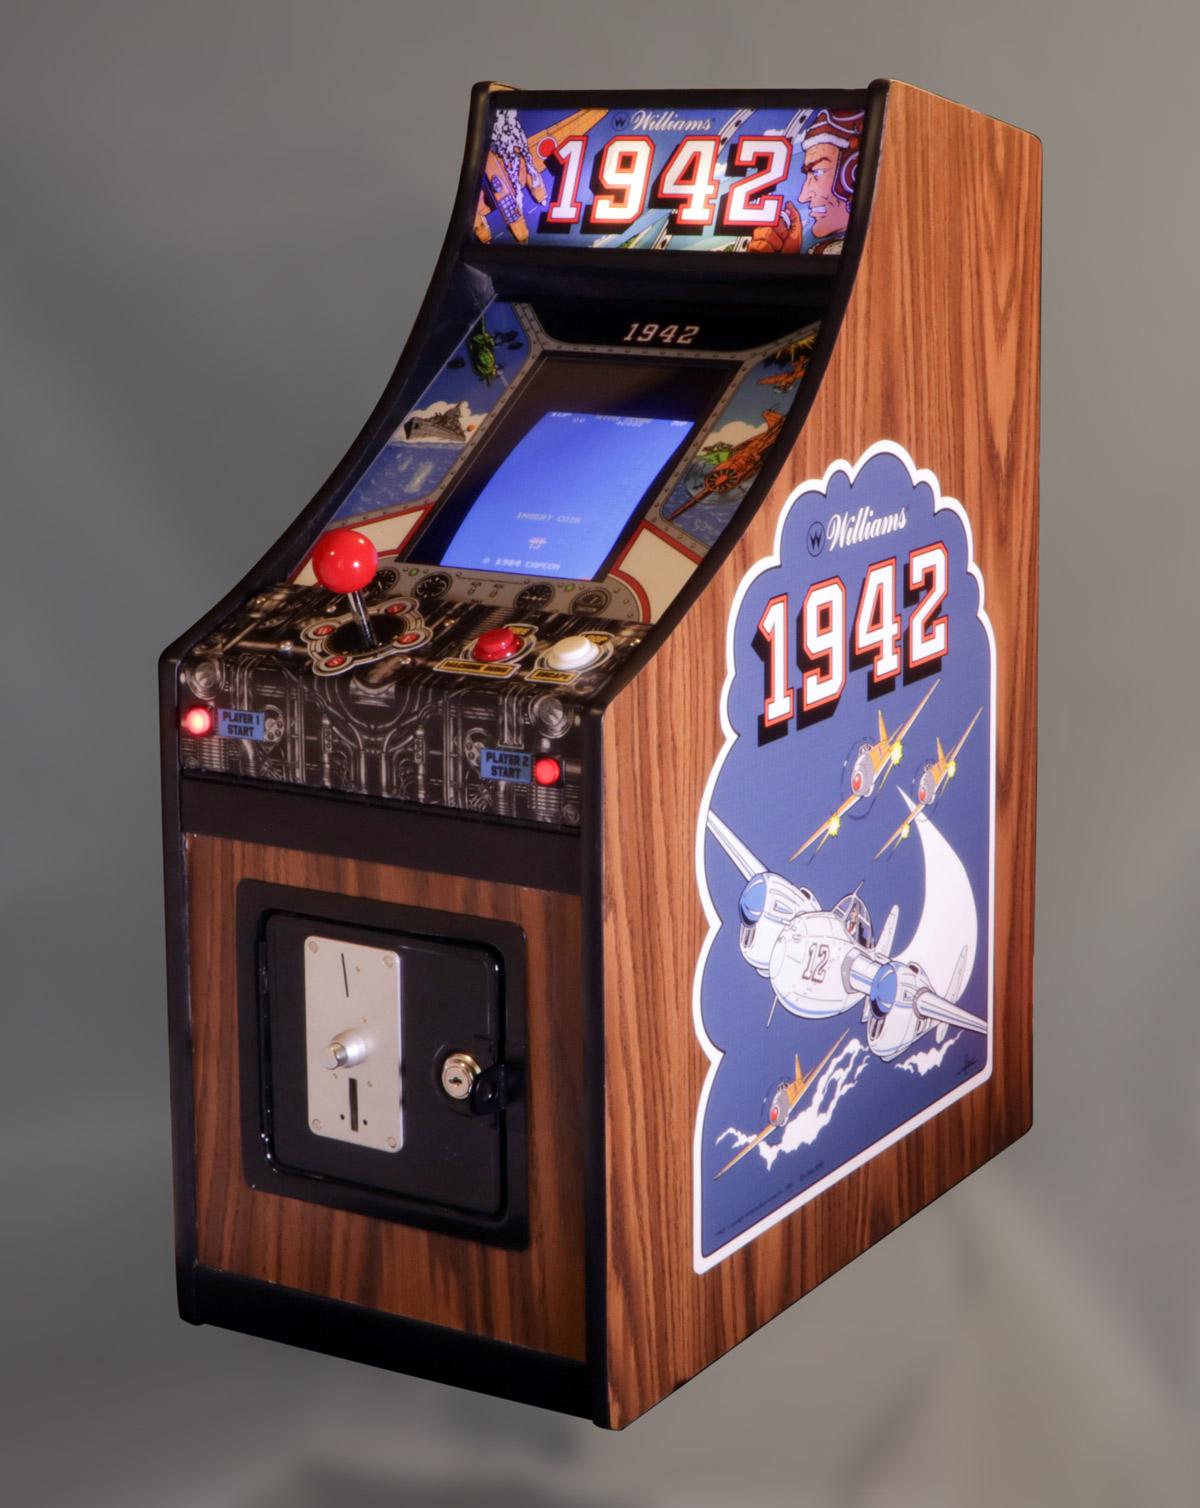 1942 Small Change Arcade